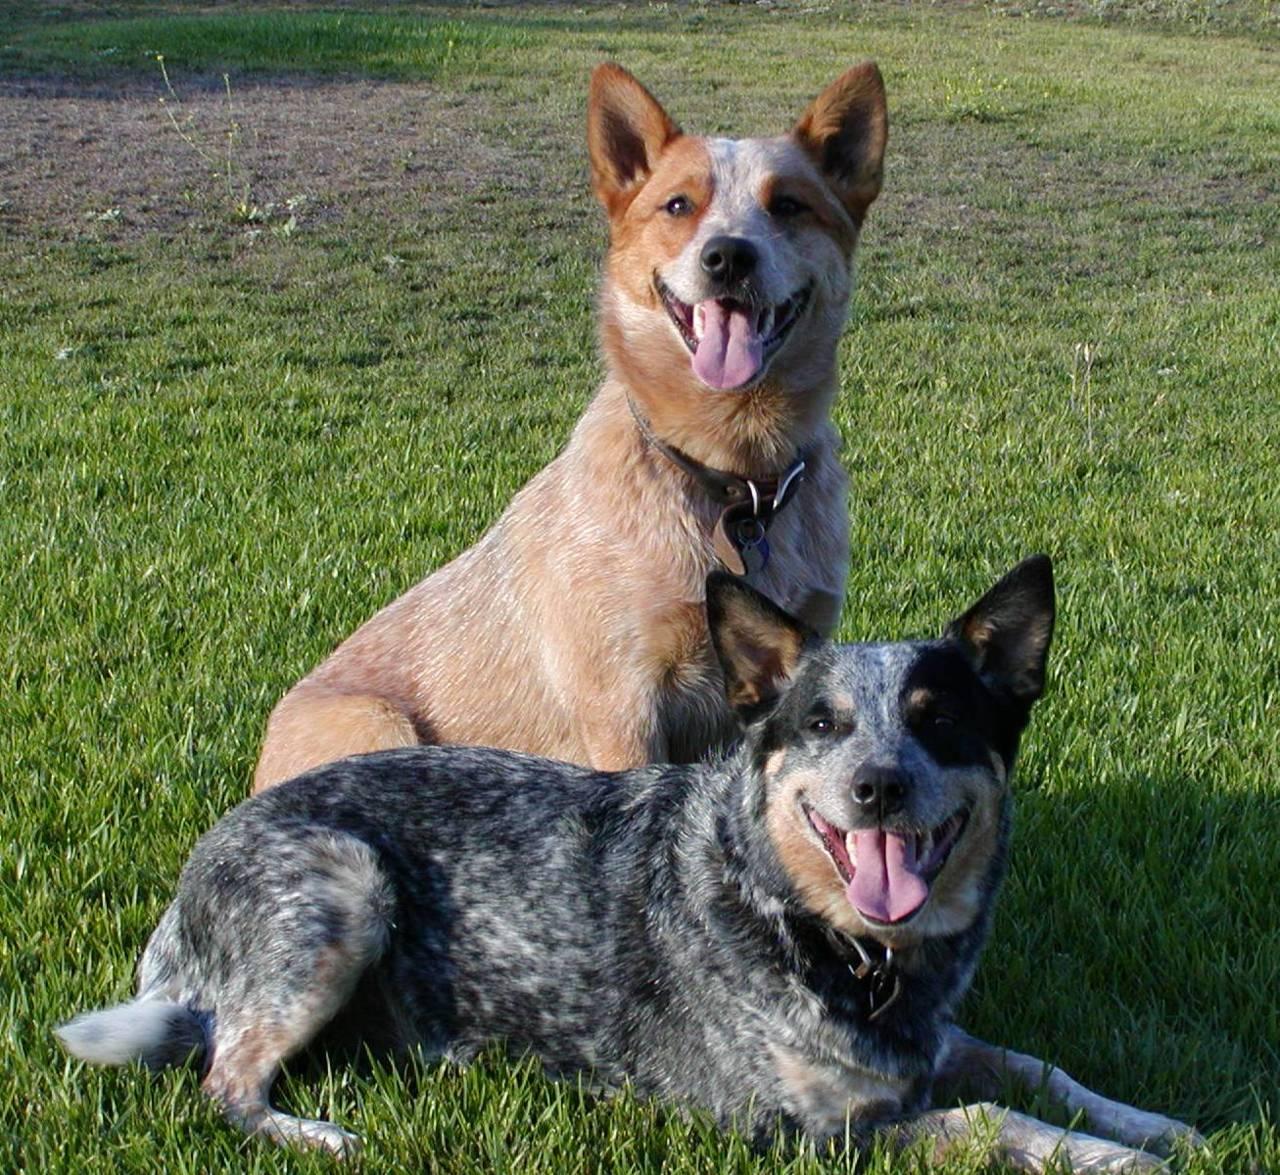 Australian Cattle Dog - SAKC Dogs Wiki